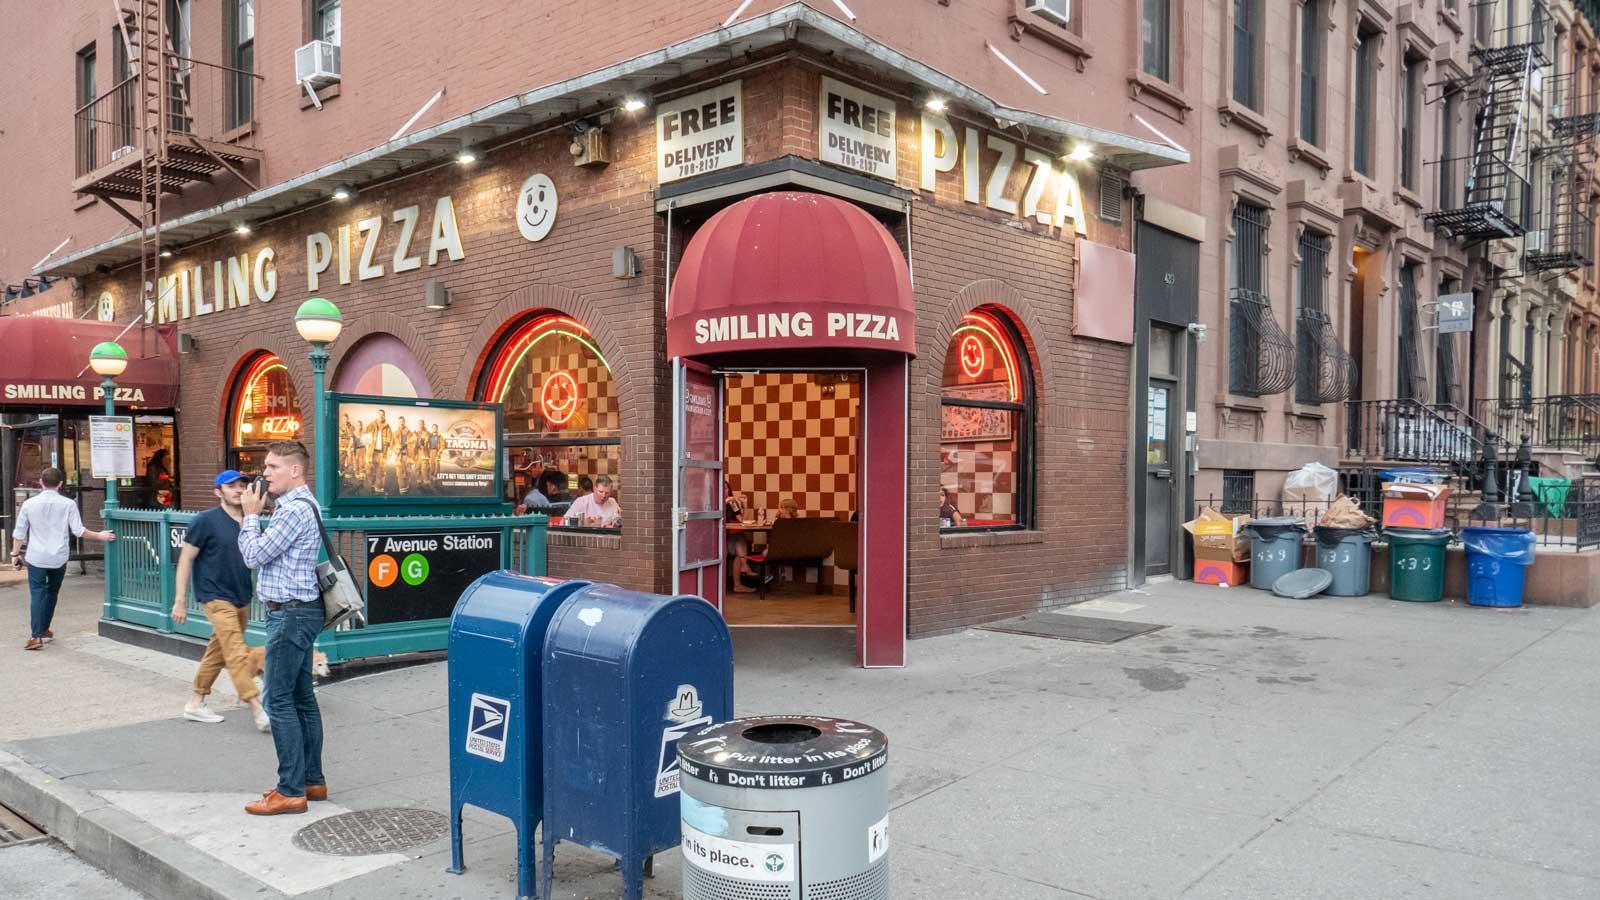 Smiling Pizza 7 Avenue F G train station Brooklyn